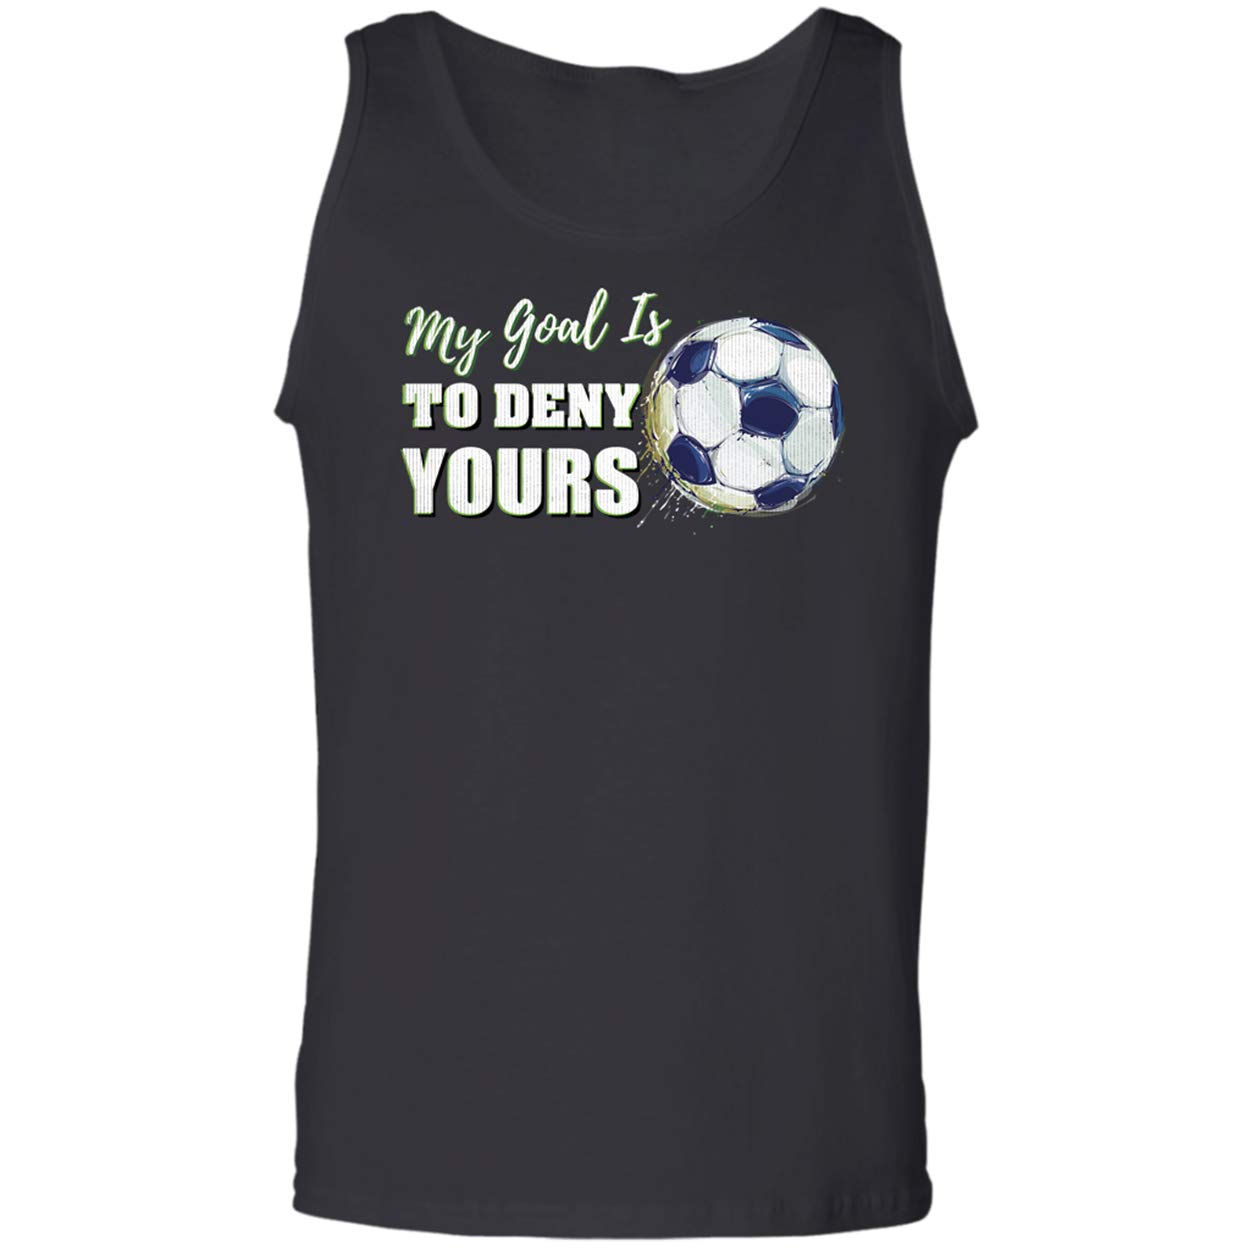 Teechopchop Go Football,Funny My Goal is to Deny Your Tank Top